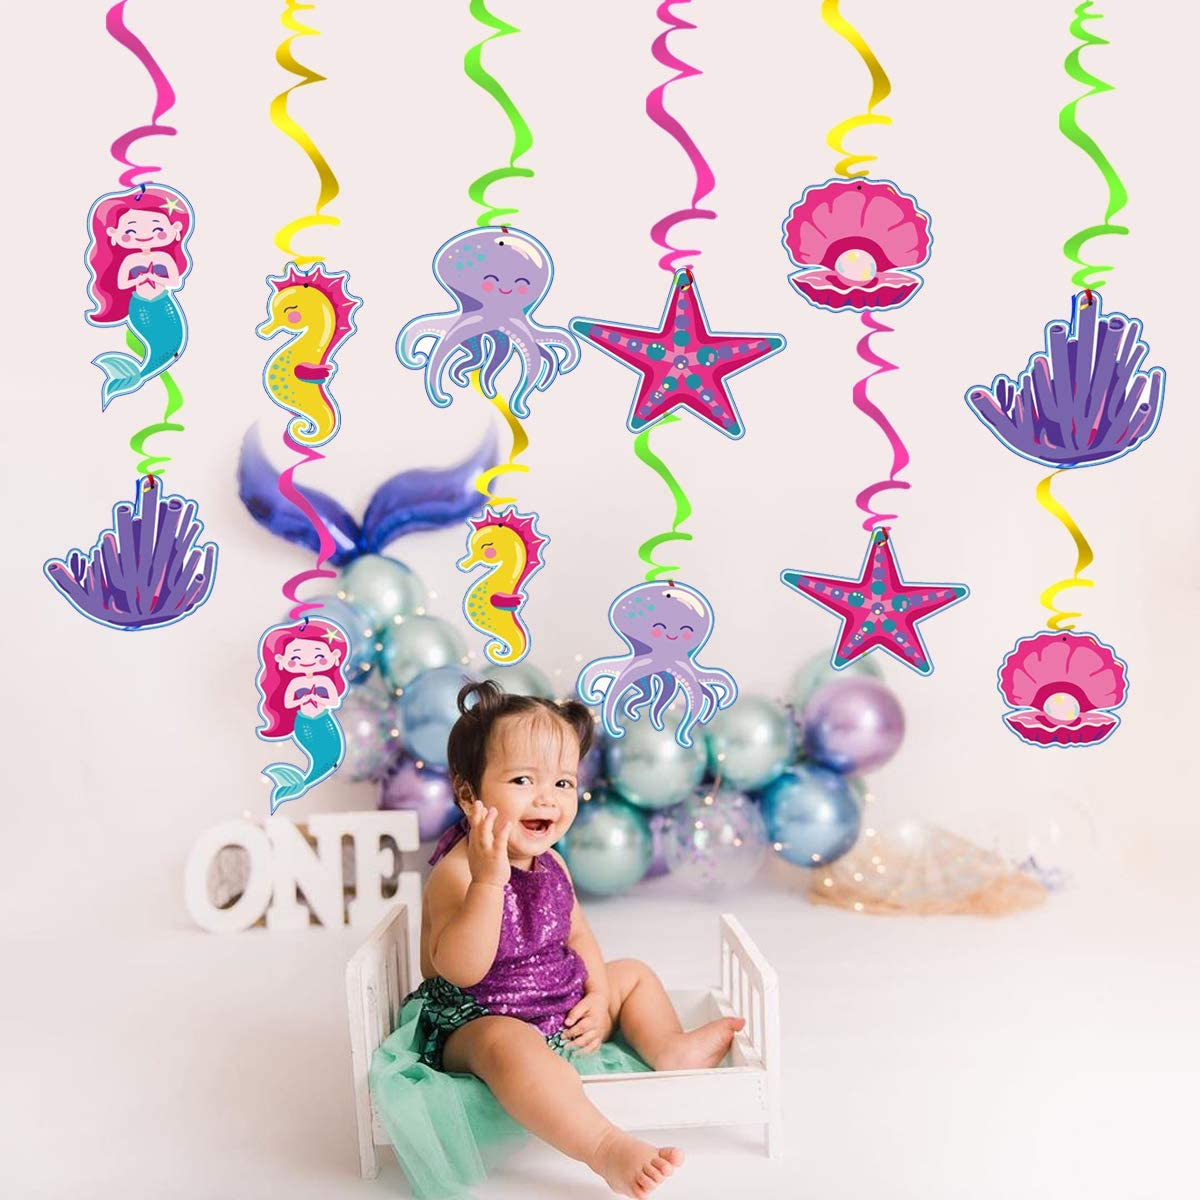 Marine Birthday Party Decorations Mermaid Themed Party Supplies 30 pcs Mermaid Hanging Swirls